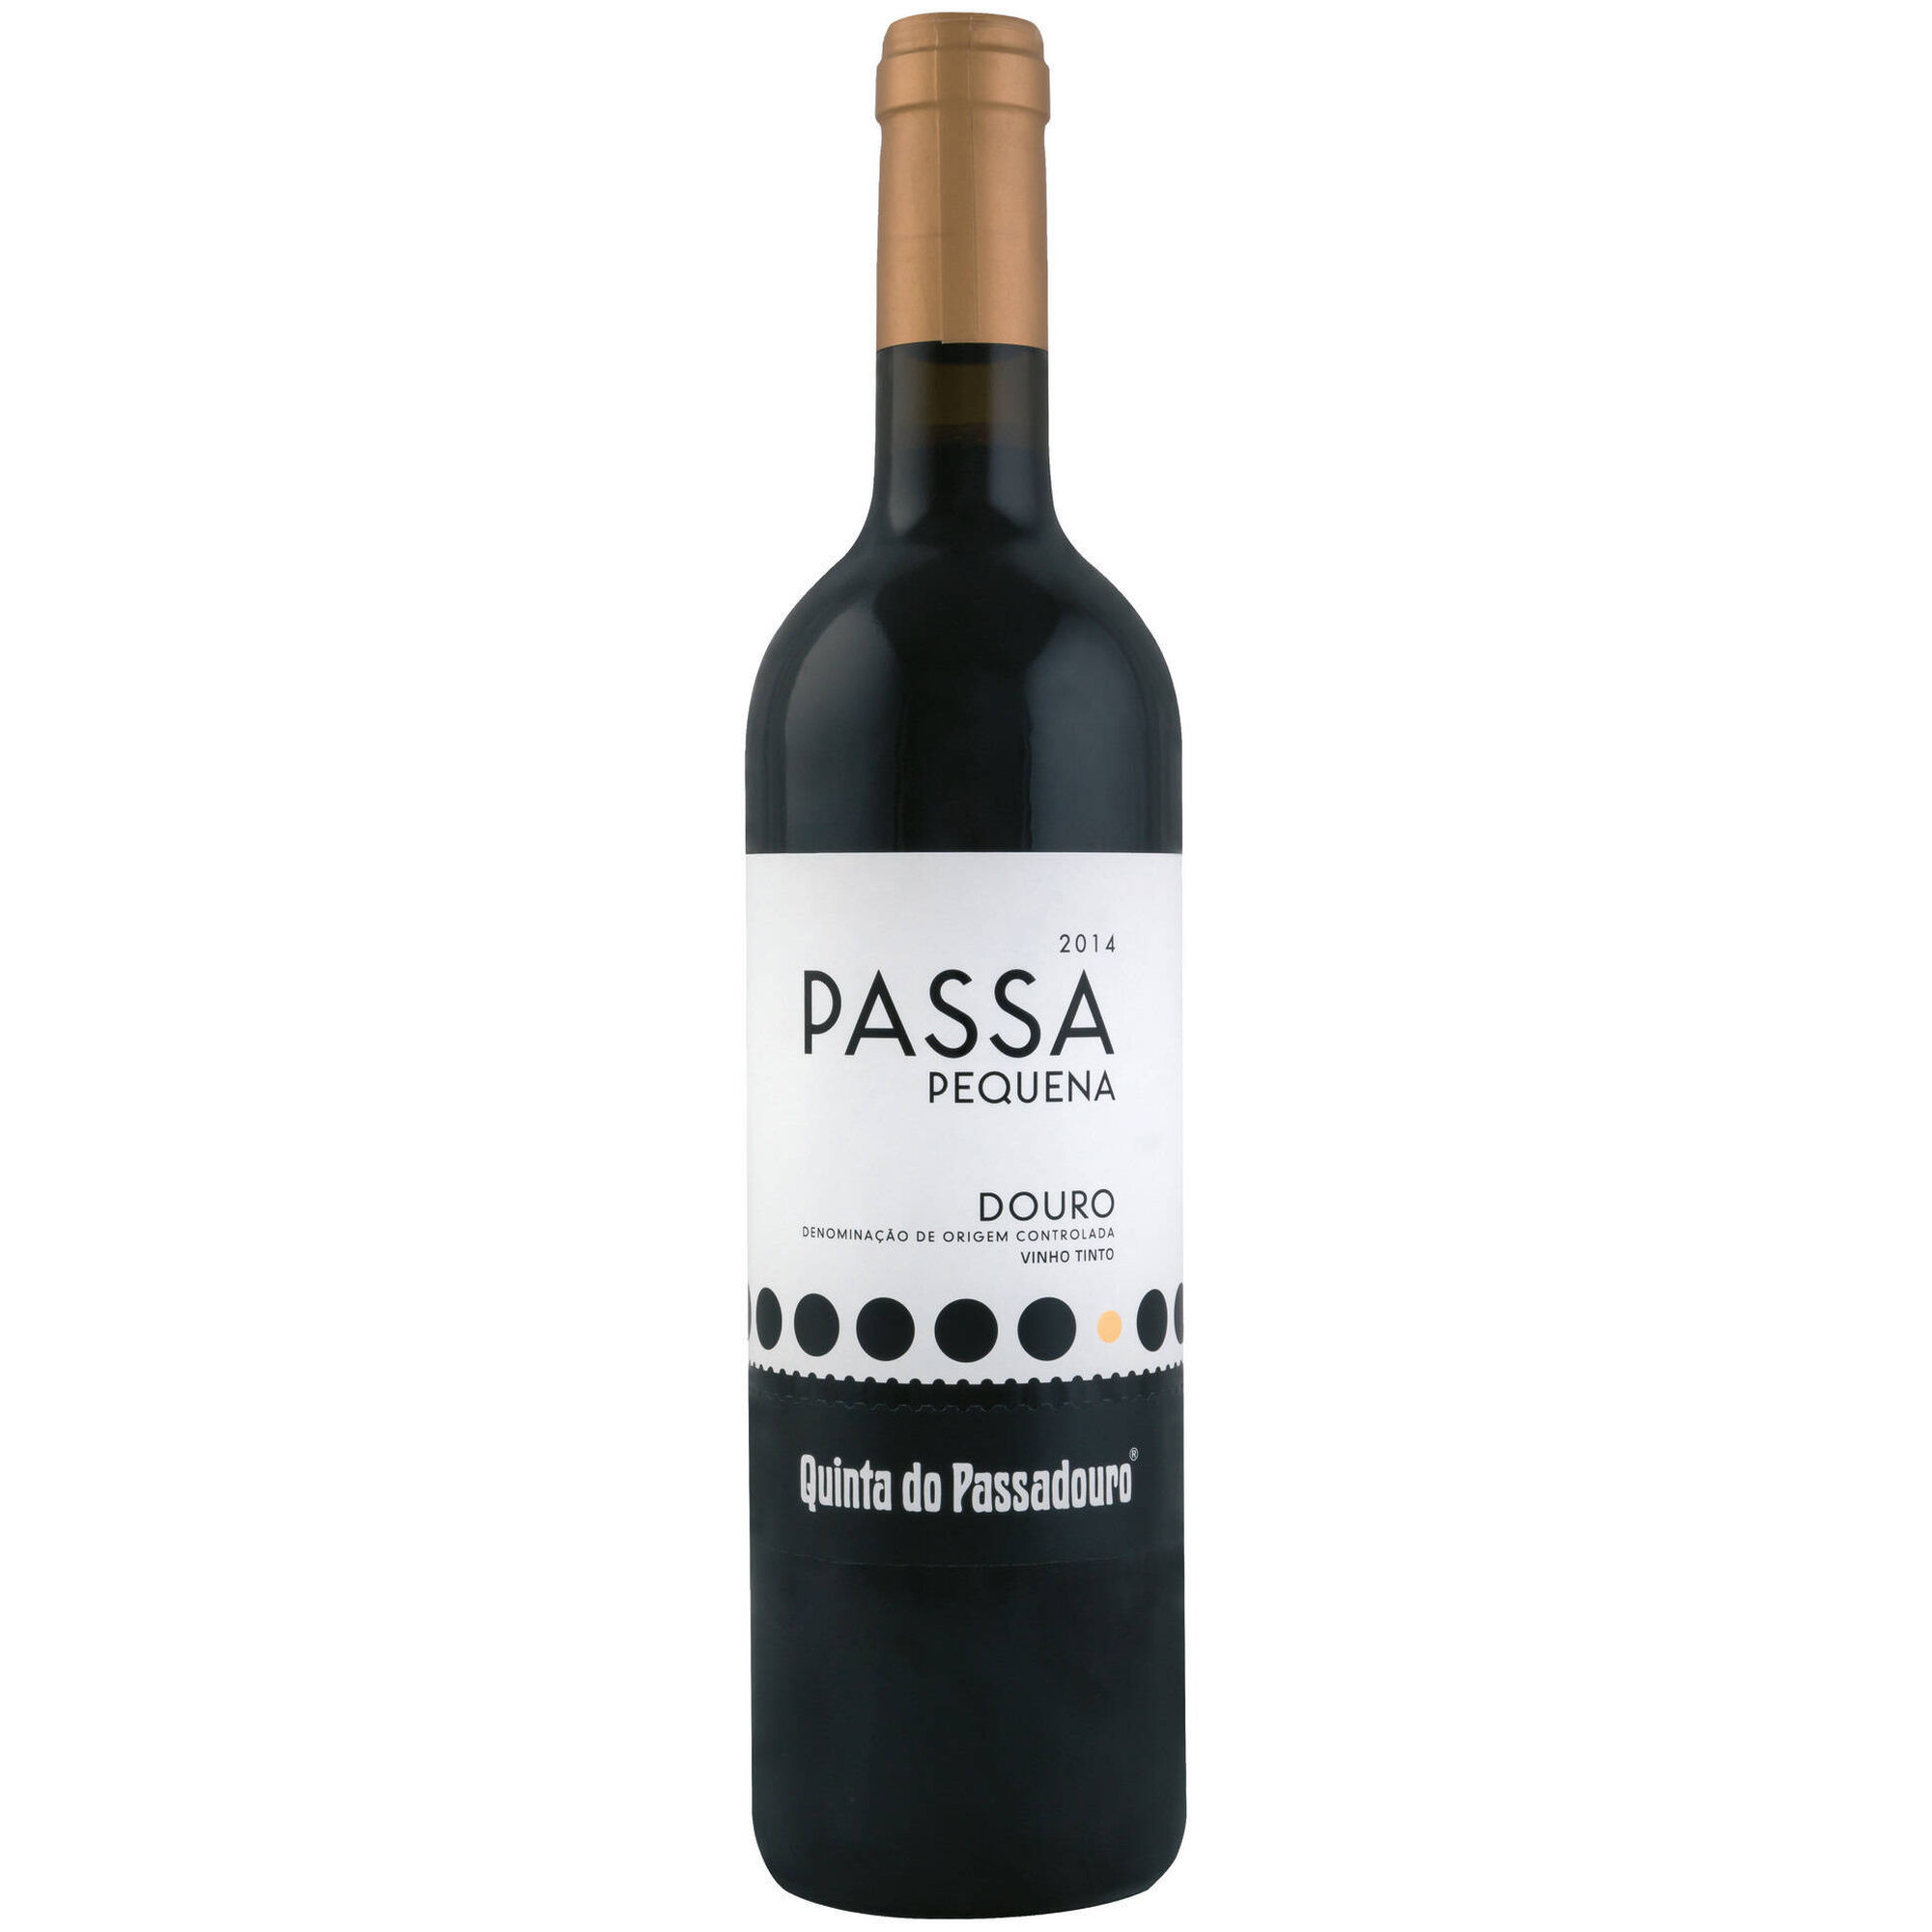 Passa Pequena DOC Douro Vinho Tinto